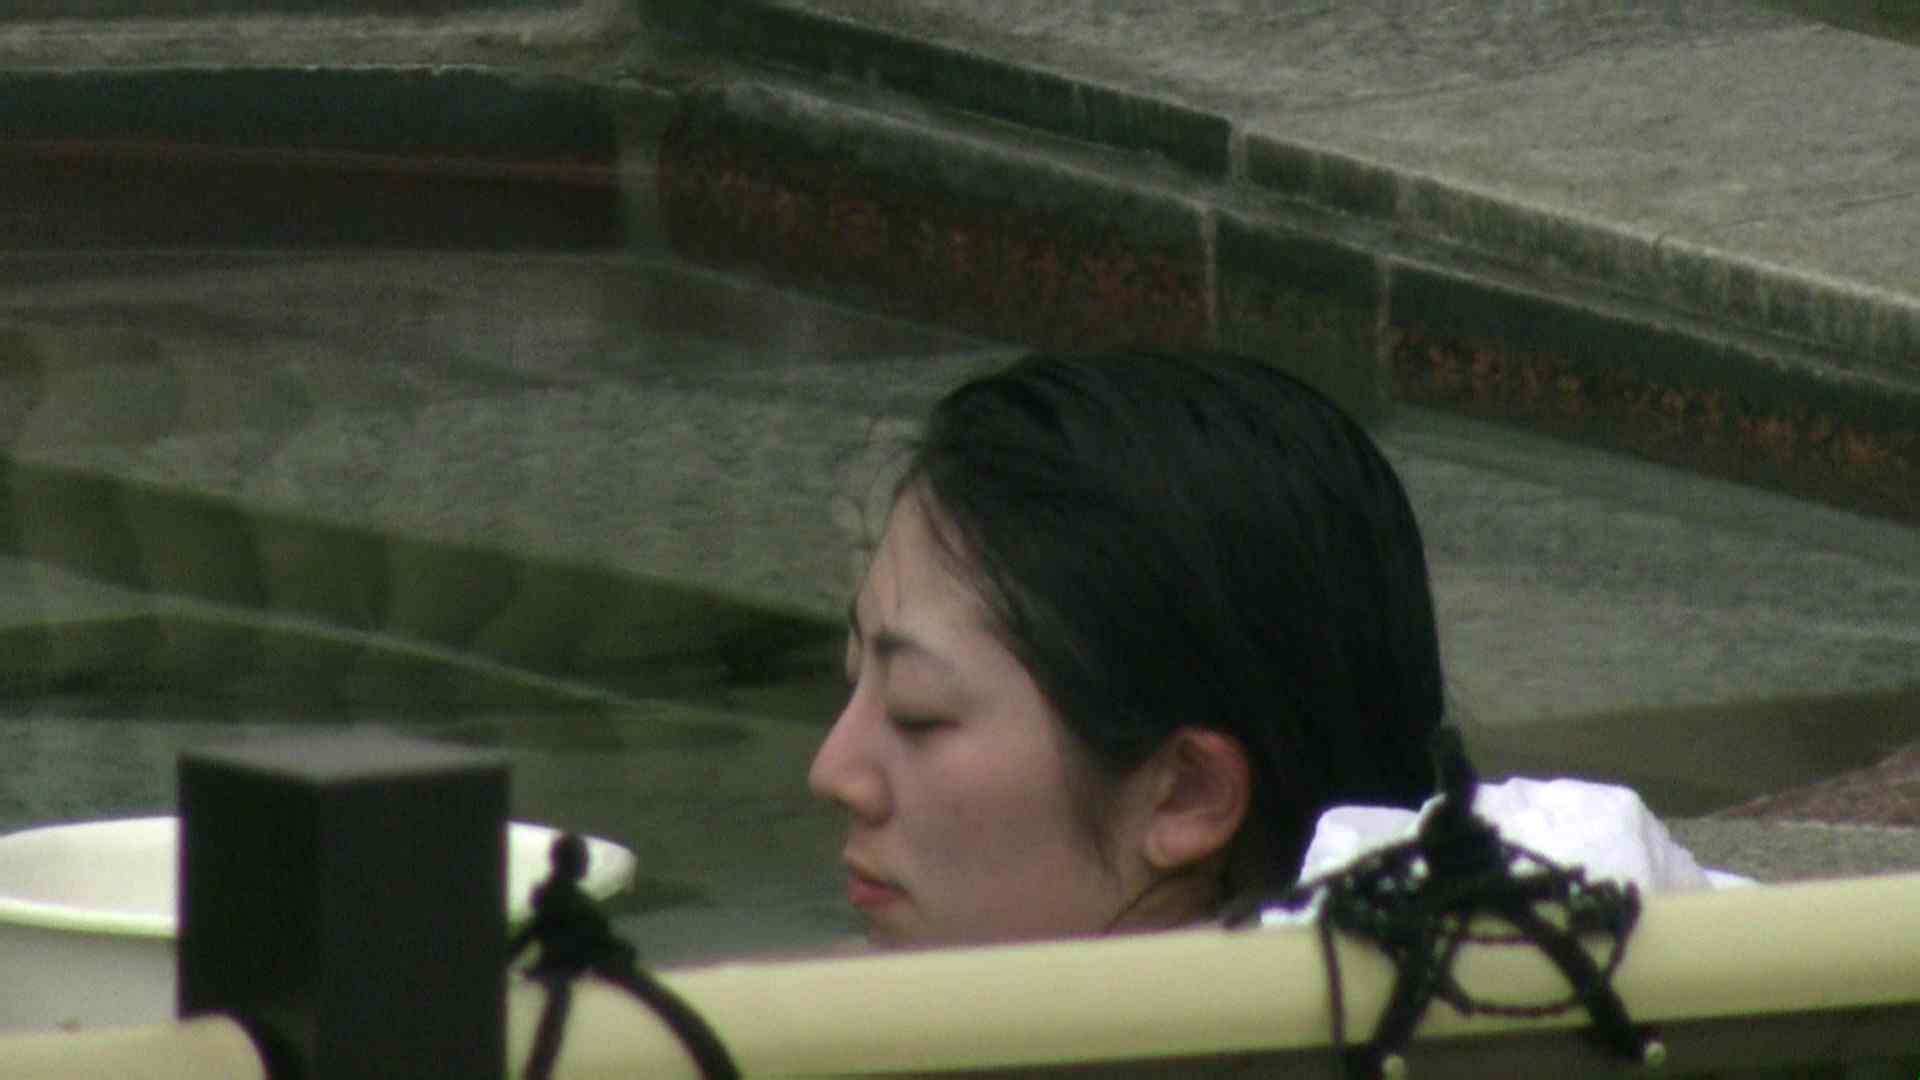 Aquaな露天風呂Vol.04 露天風呂編  94PIX 18